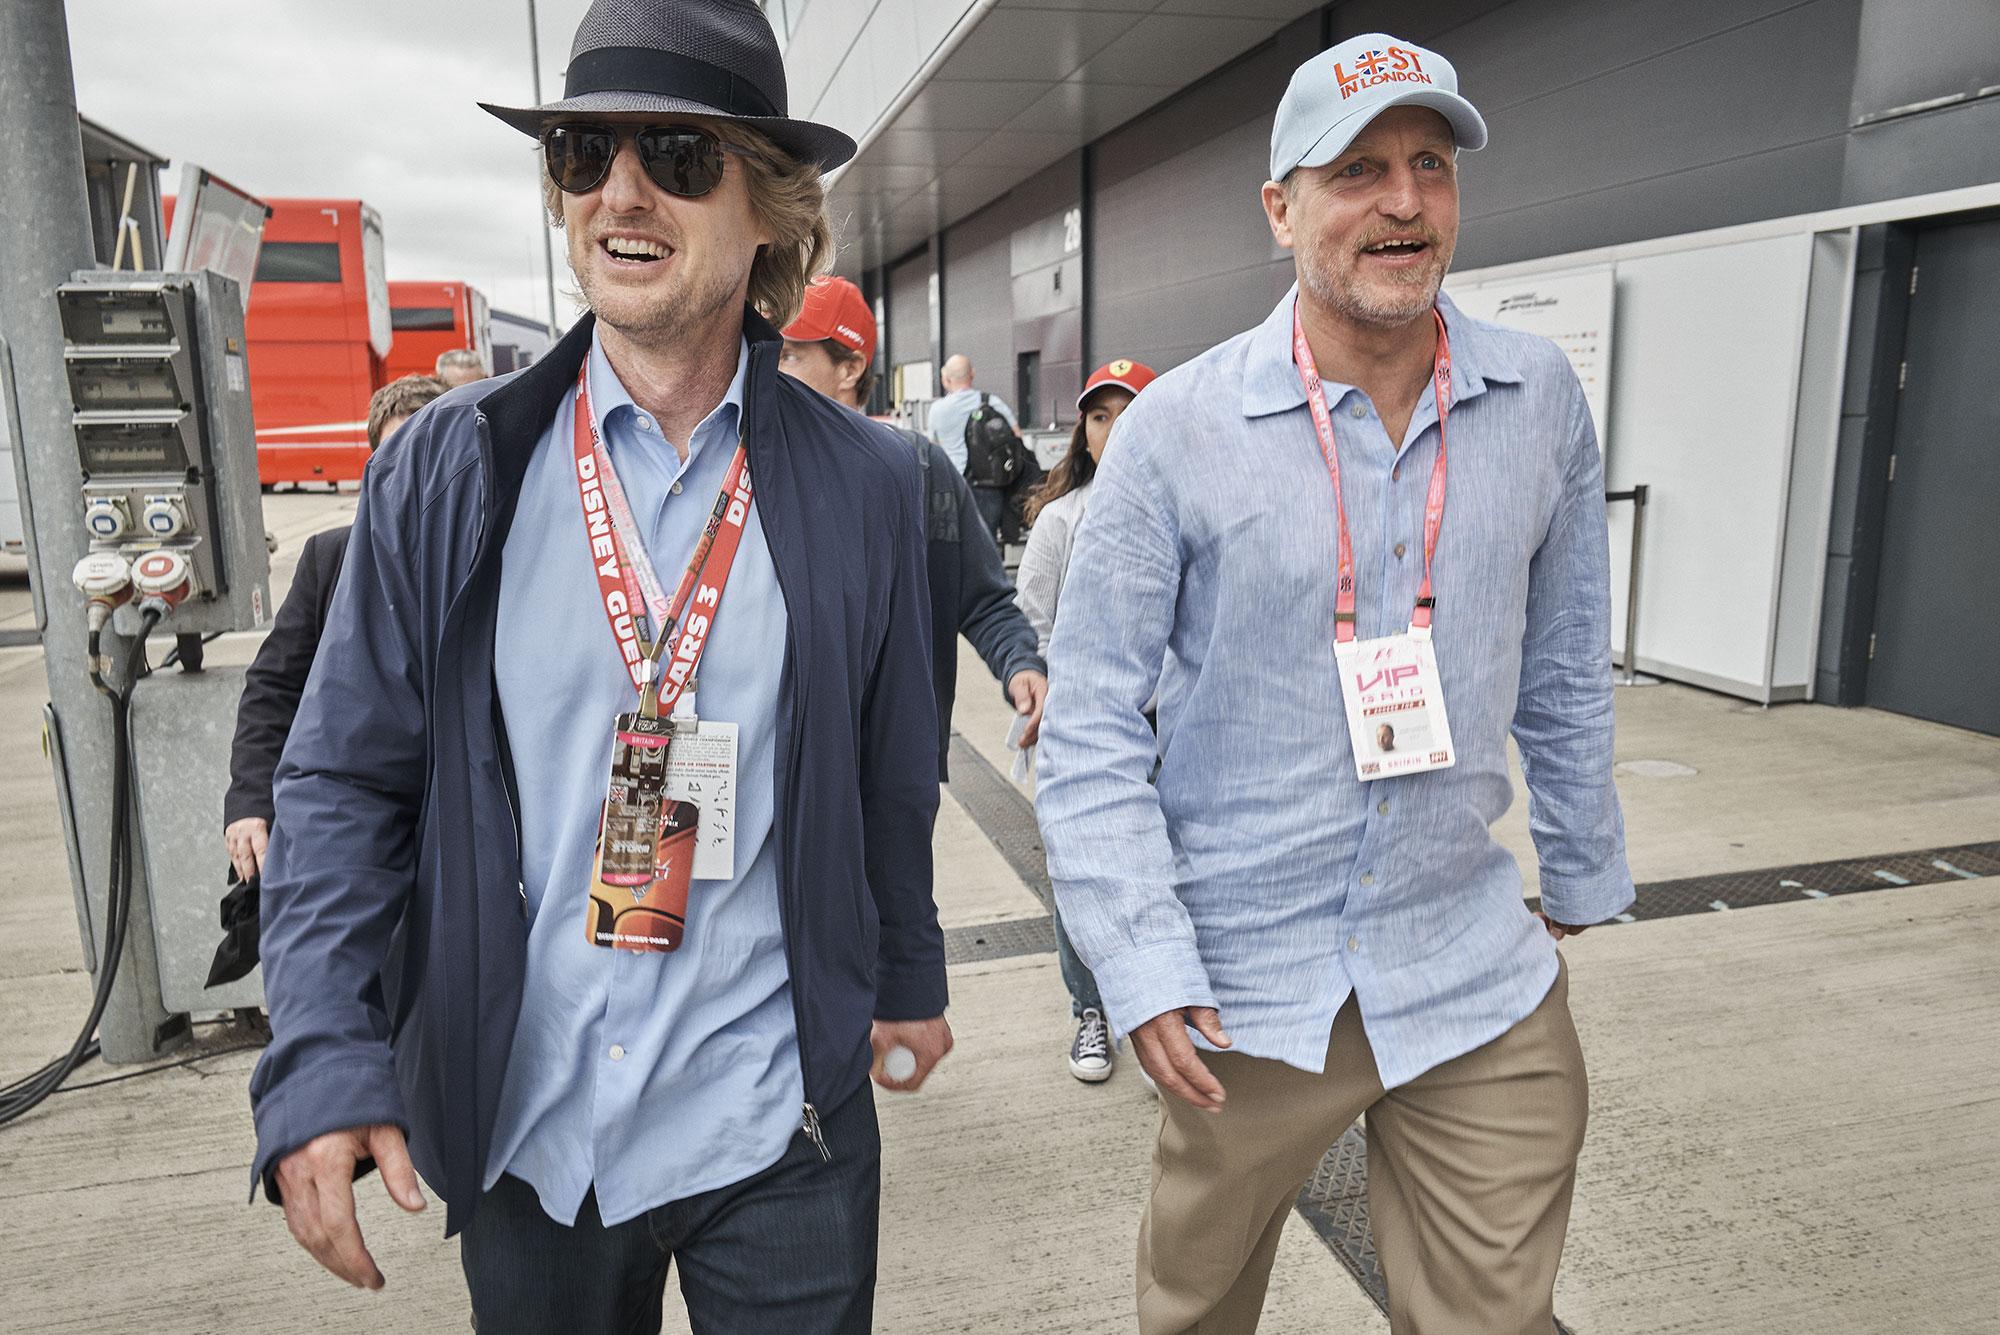 Owen Wilson and Woody Harrleson